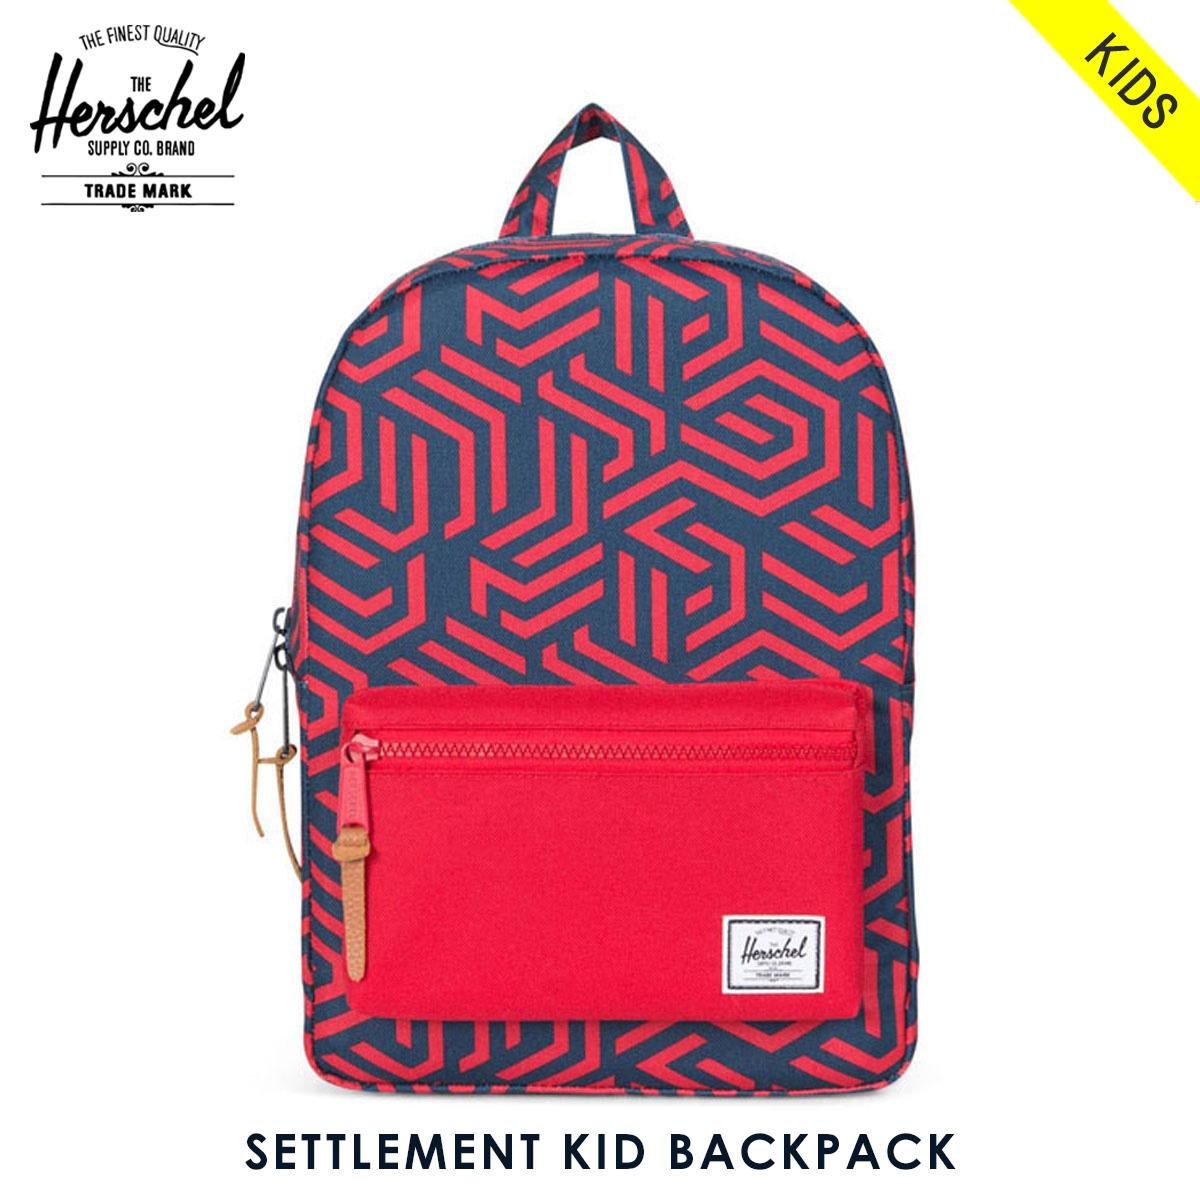 72226d4c790b Herschel supply Herschel Supply regular sale shop bag rucksack SETTLEMENT  KID BACKPACK 10074-01209-OS NAVY METRIC RED